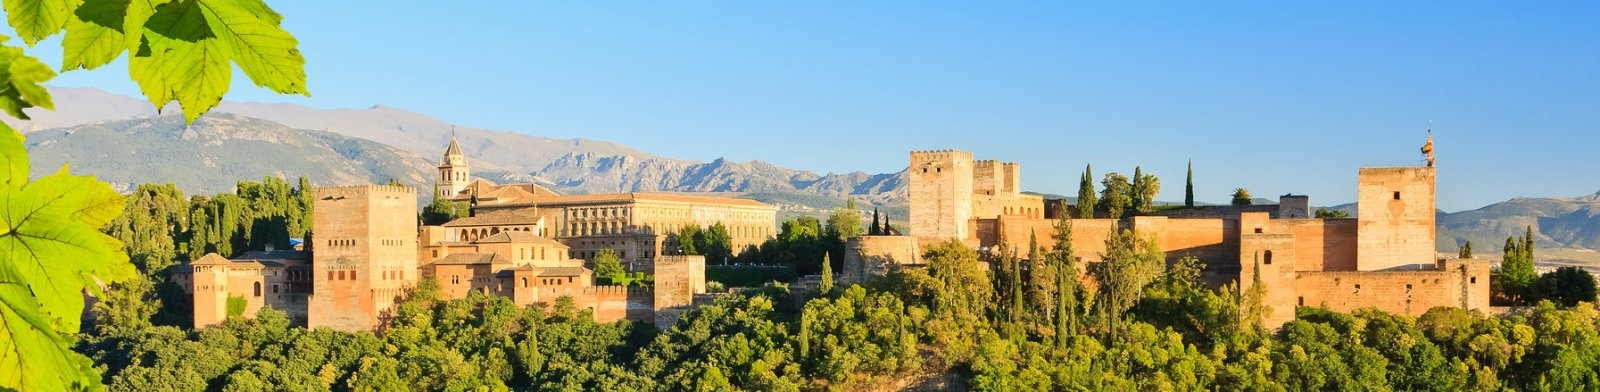 Granada, main image